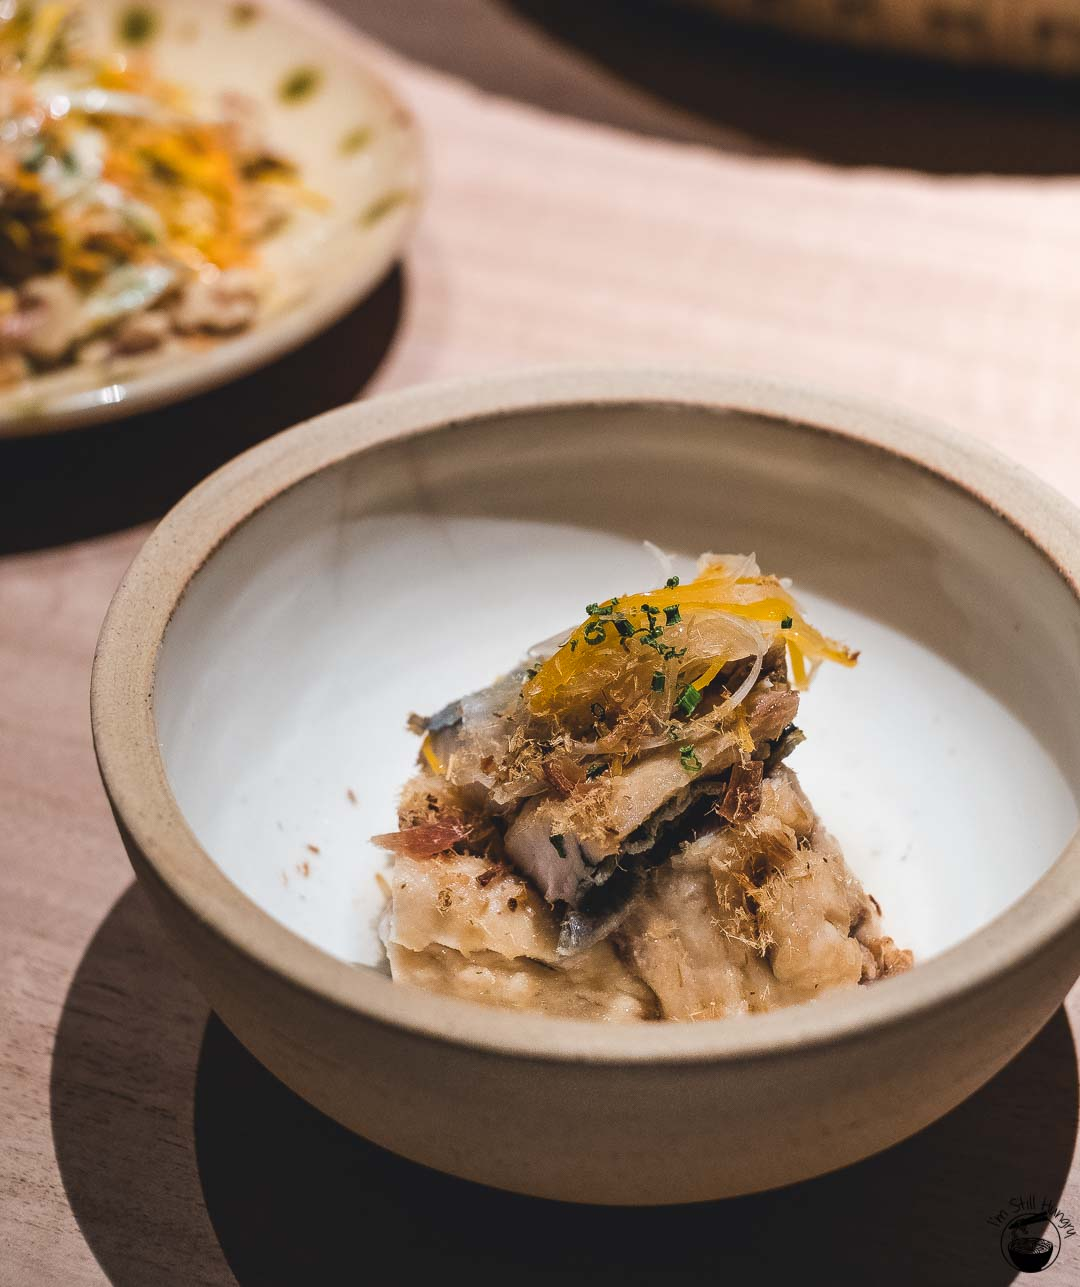 Restaurant Sasaki Surry Hills Second Visit-5 Takimono: fermented mackerel